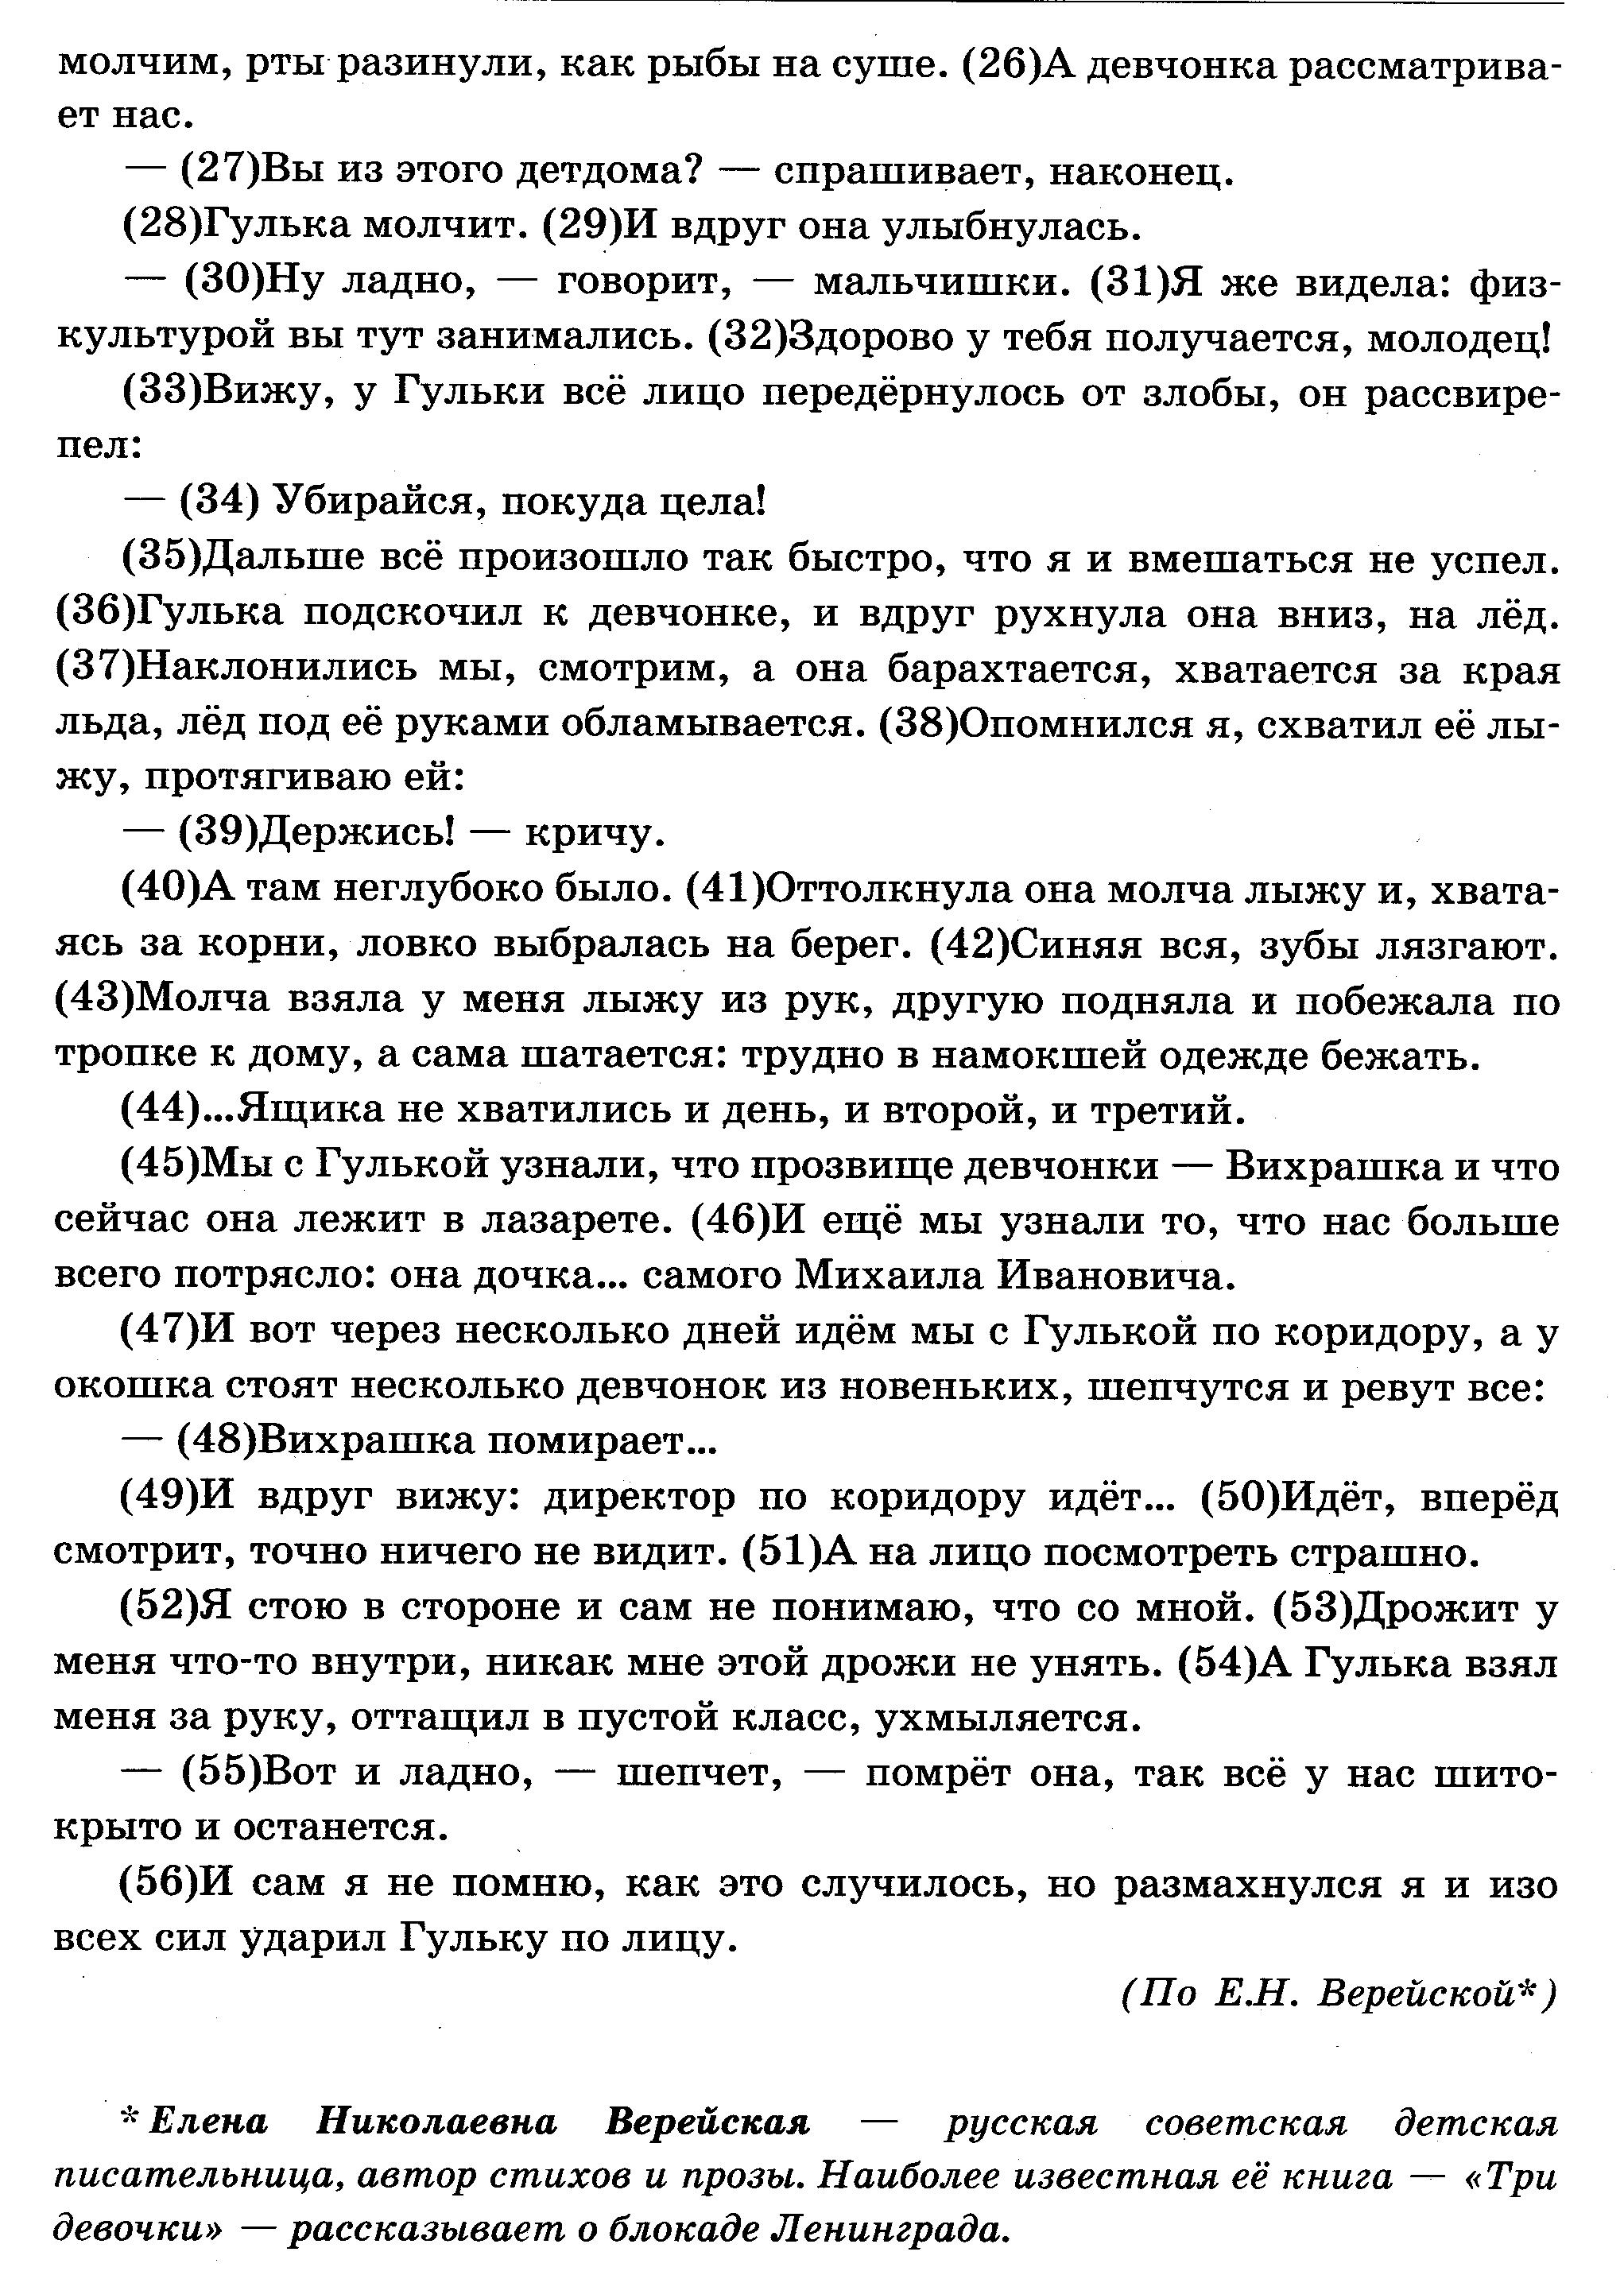 C:\Documents and Settings\Наташа\Рабочий стол\ОГЭ 2016\КИМы Степановой ОГЭ-2016\img284.jpg